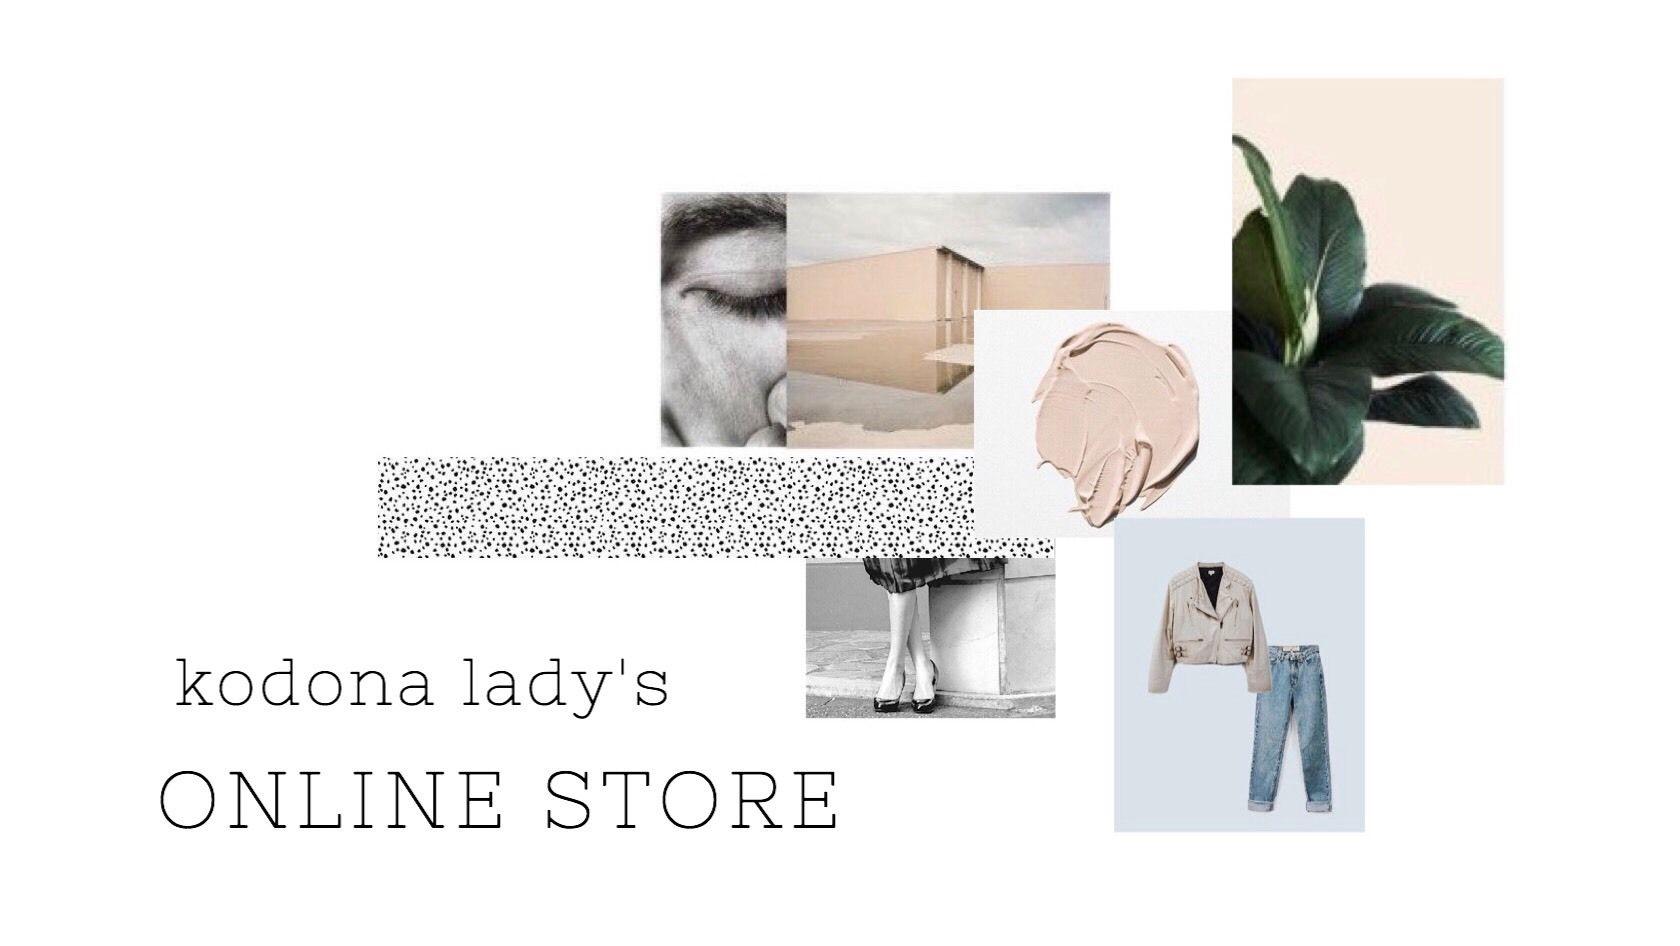 kodona lady's online store